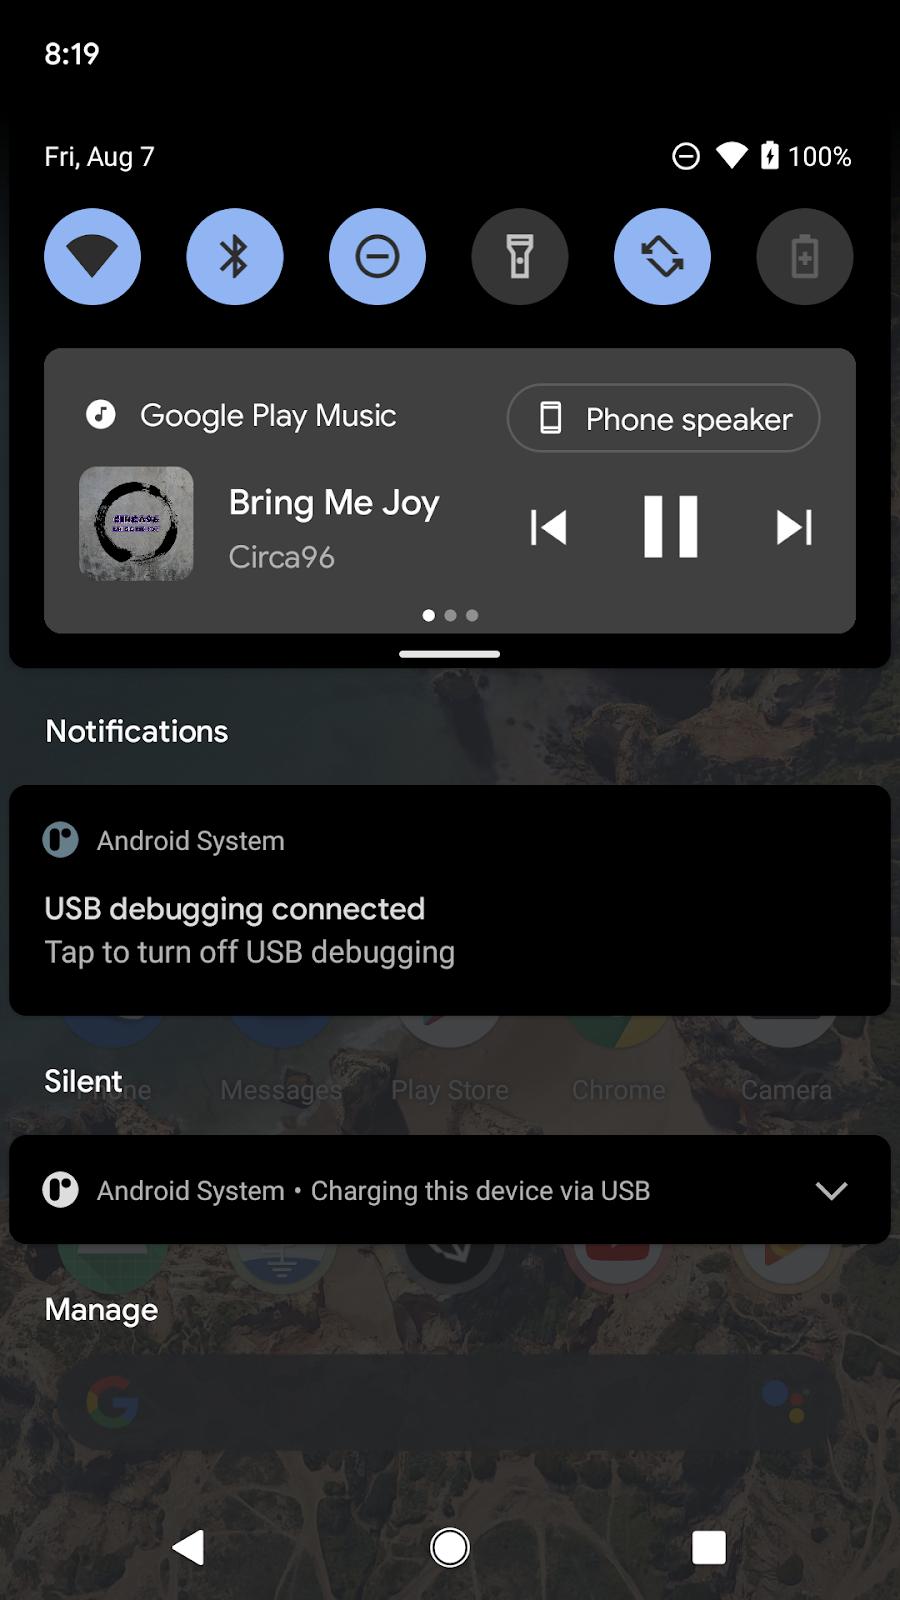 image of screen